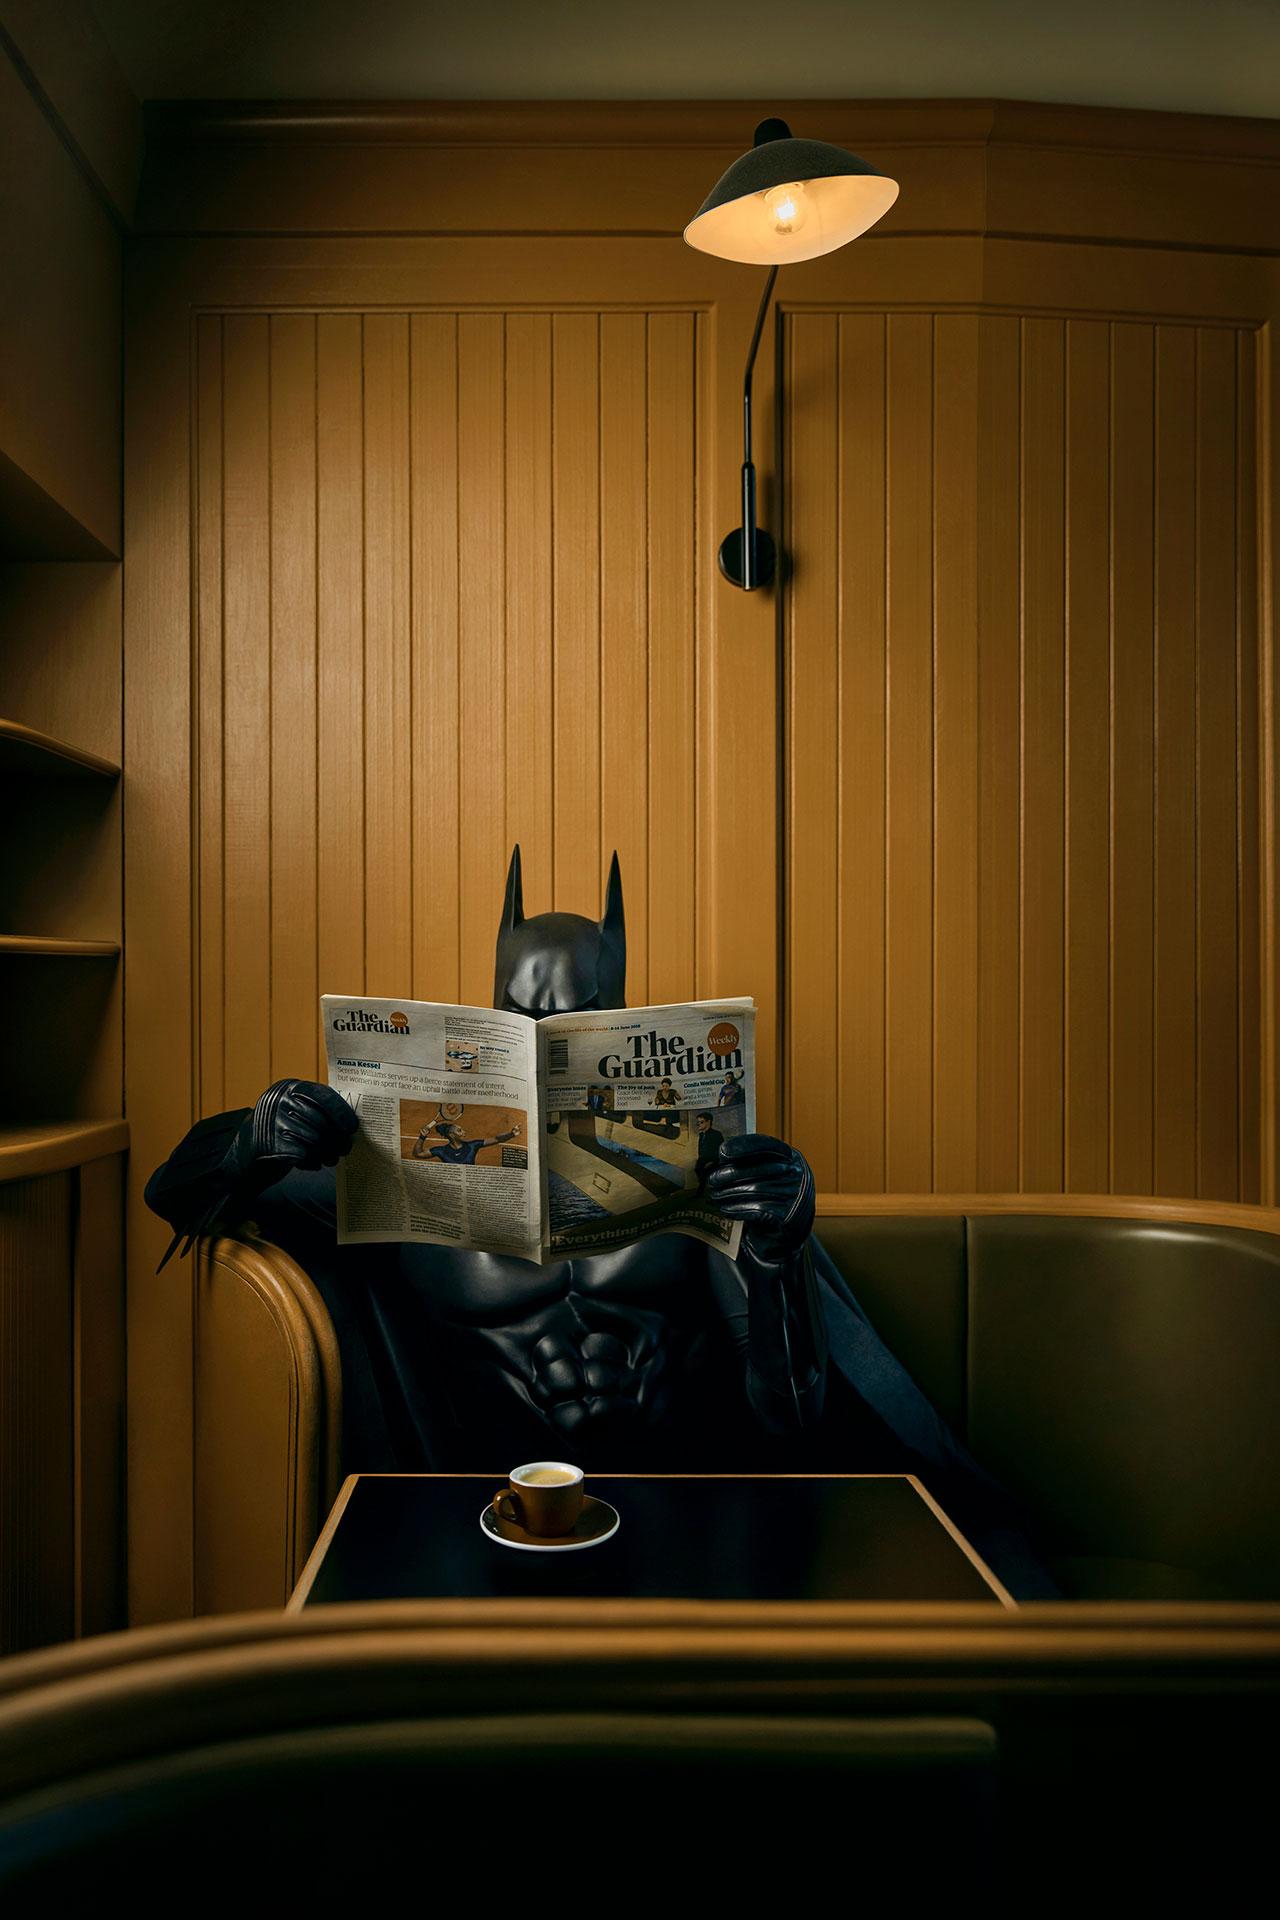 Daily Bat - Coffee and News. Photography by Sebastian Magnani.